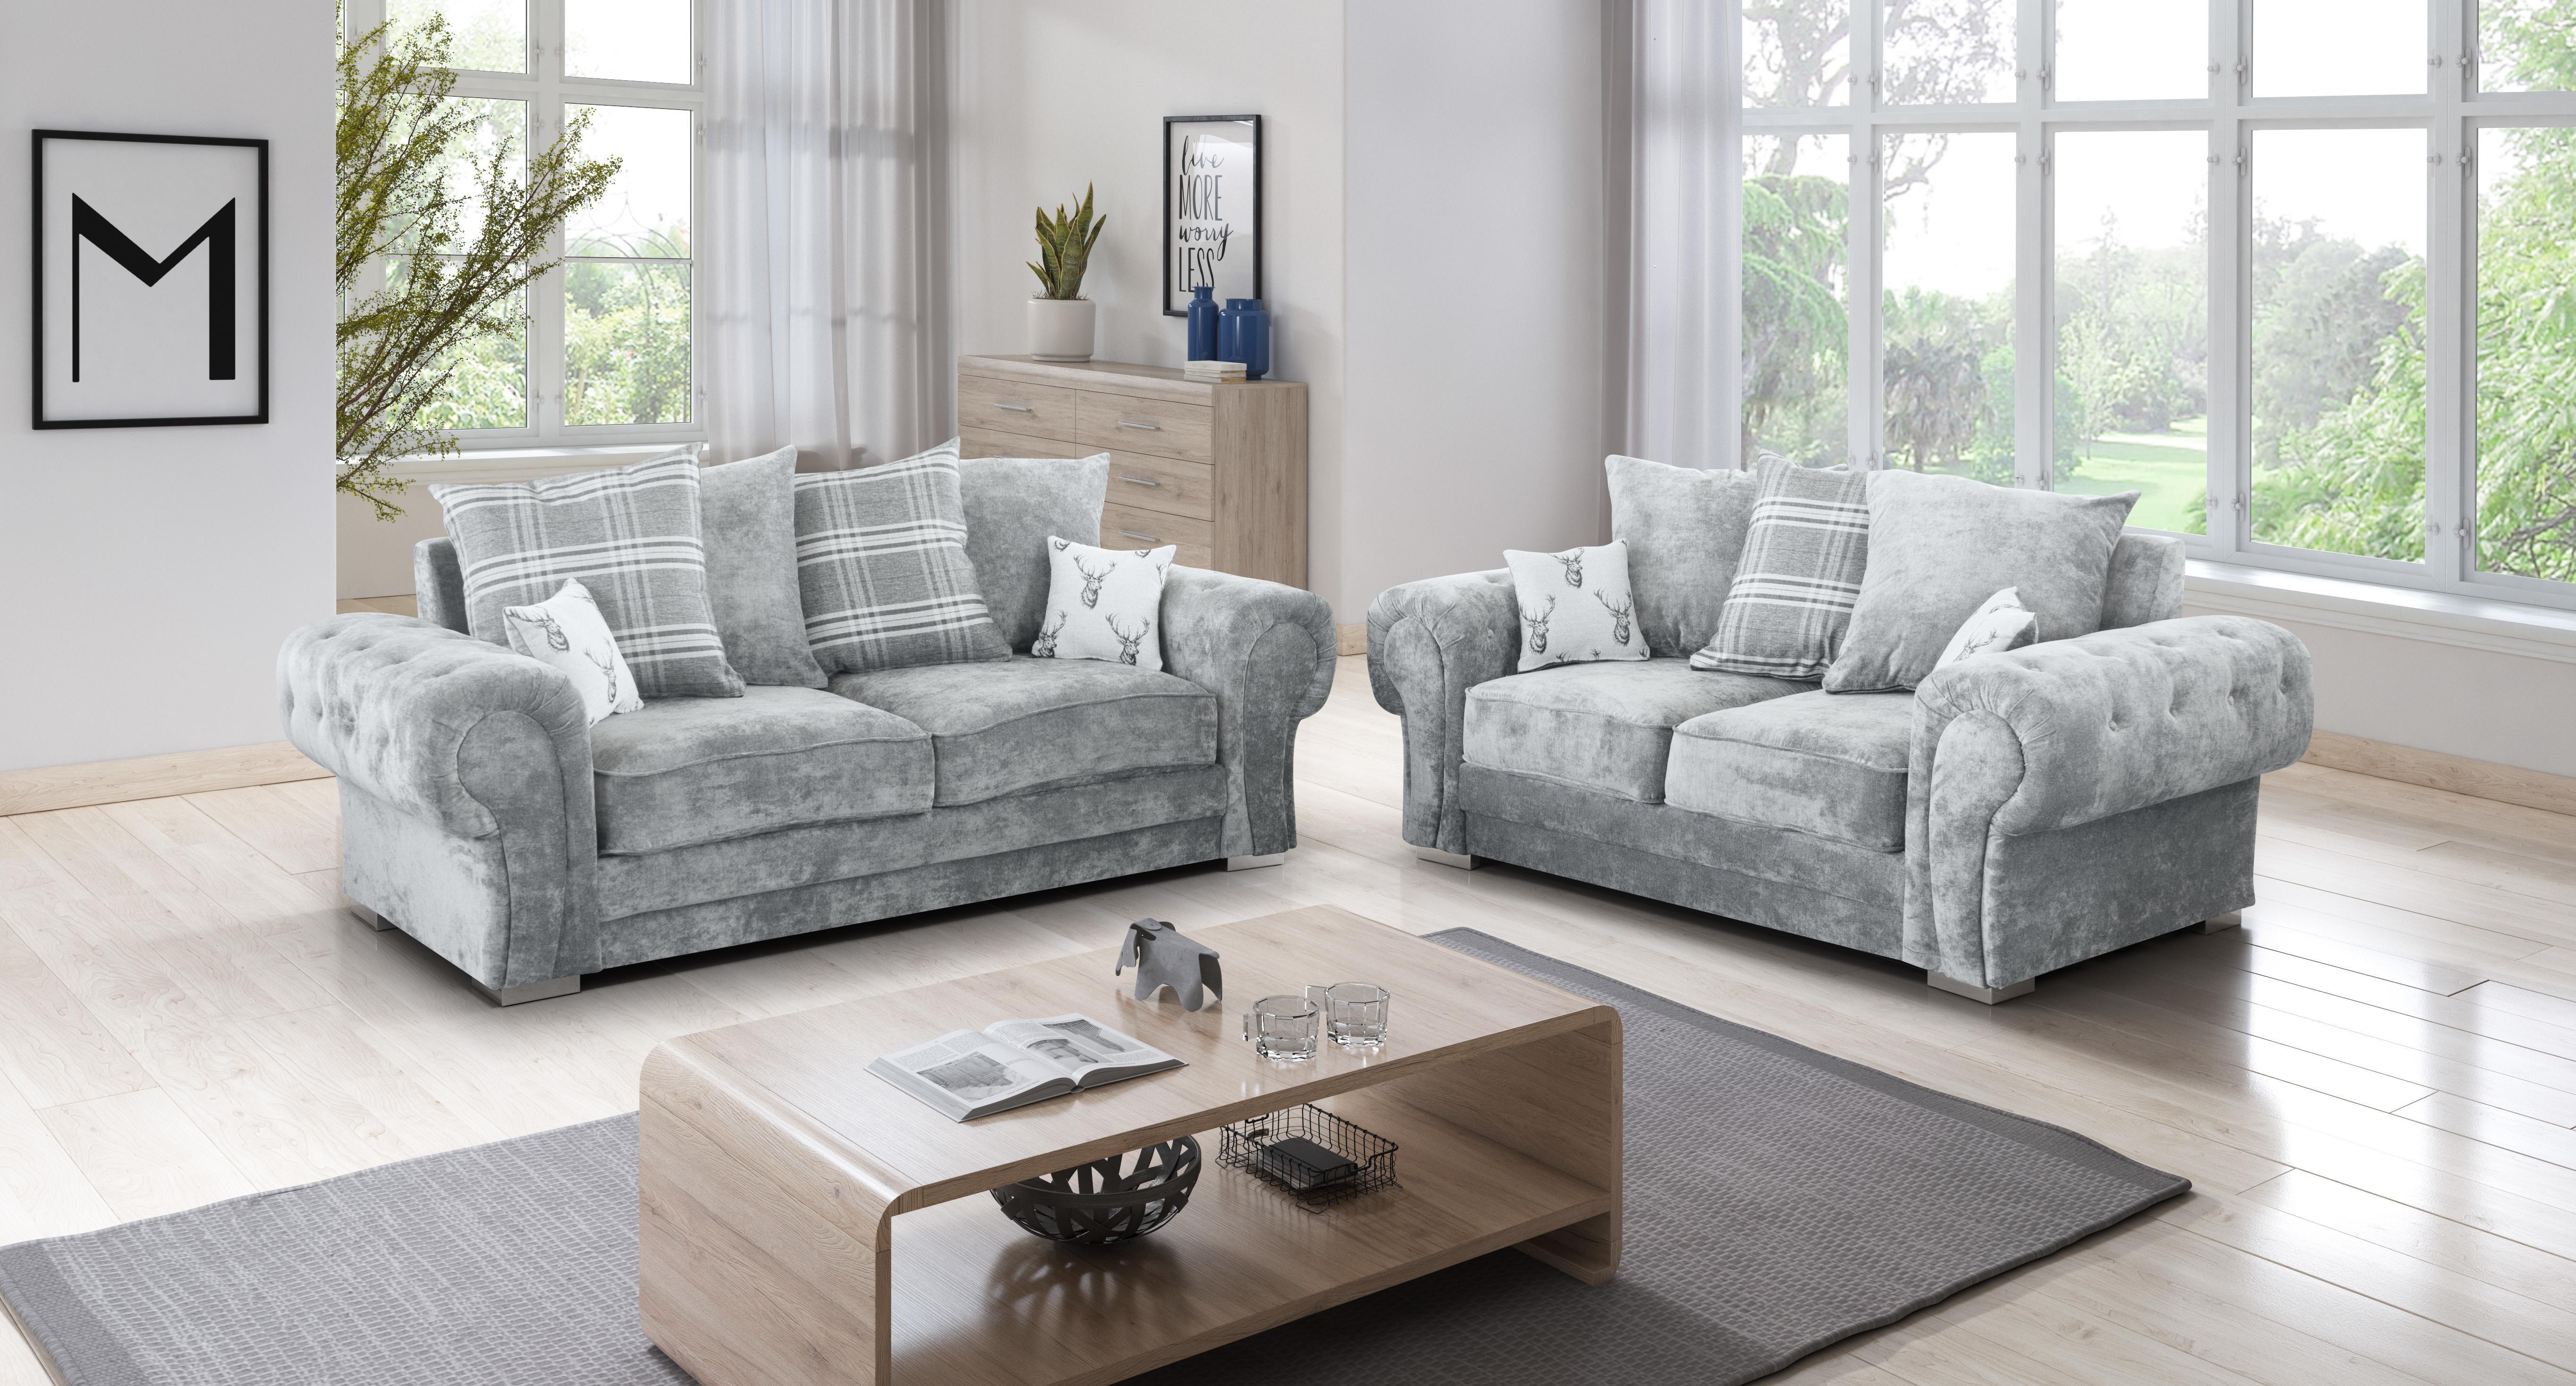 NEW Verona Sofas Suite 3+2 or Corner Sofa Silver Fabric